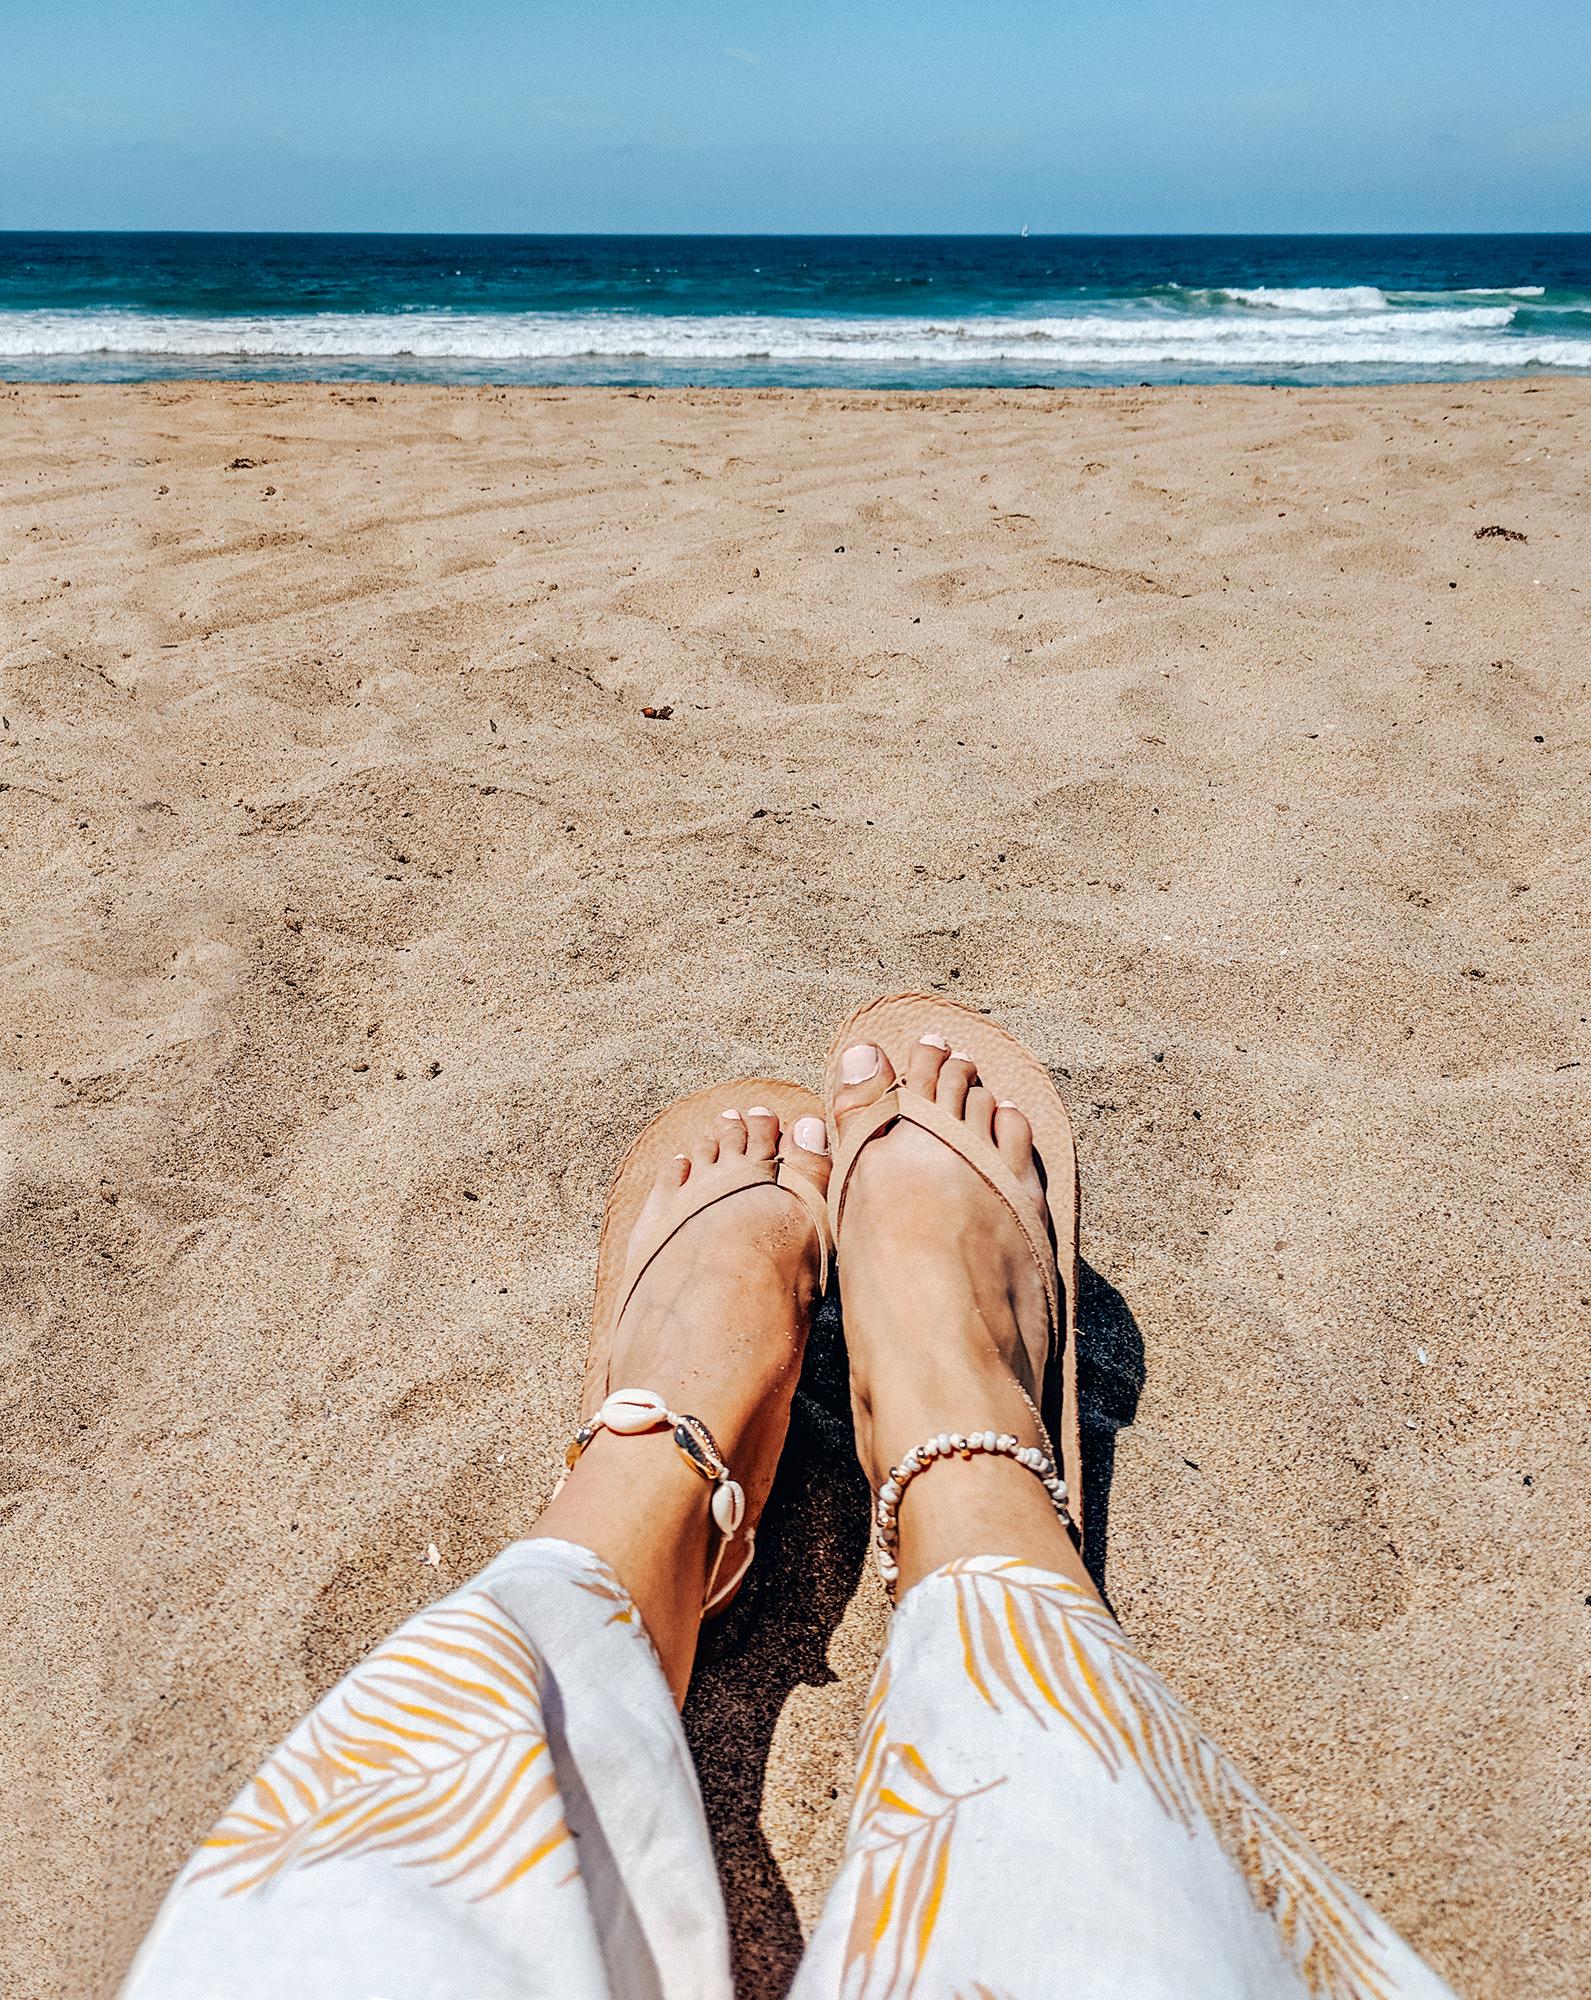 Torrance State beach sandals